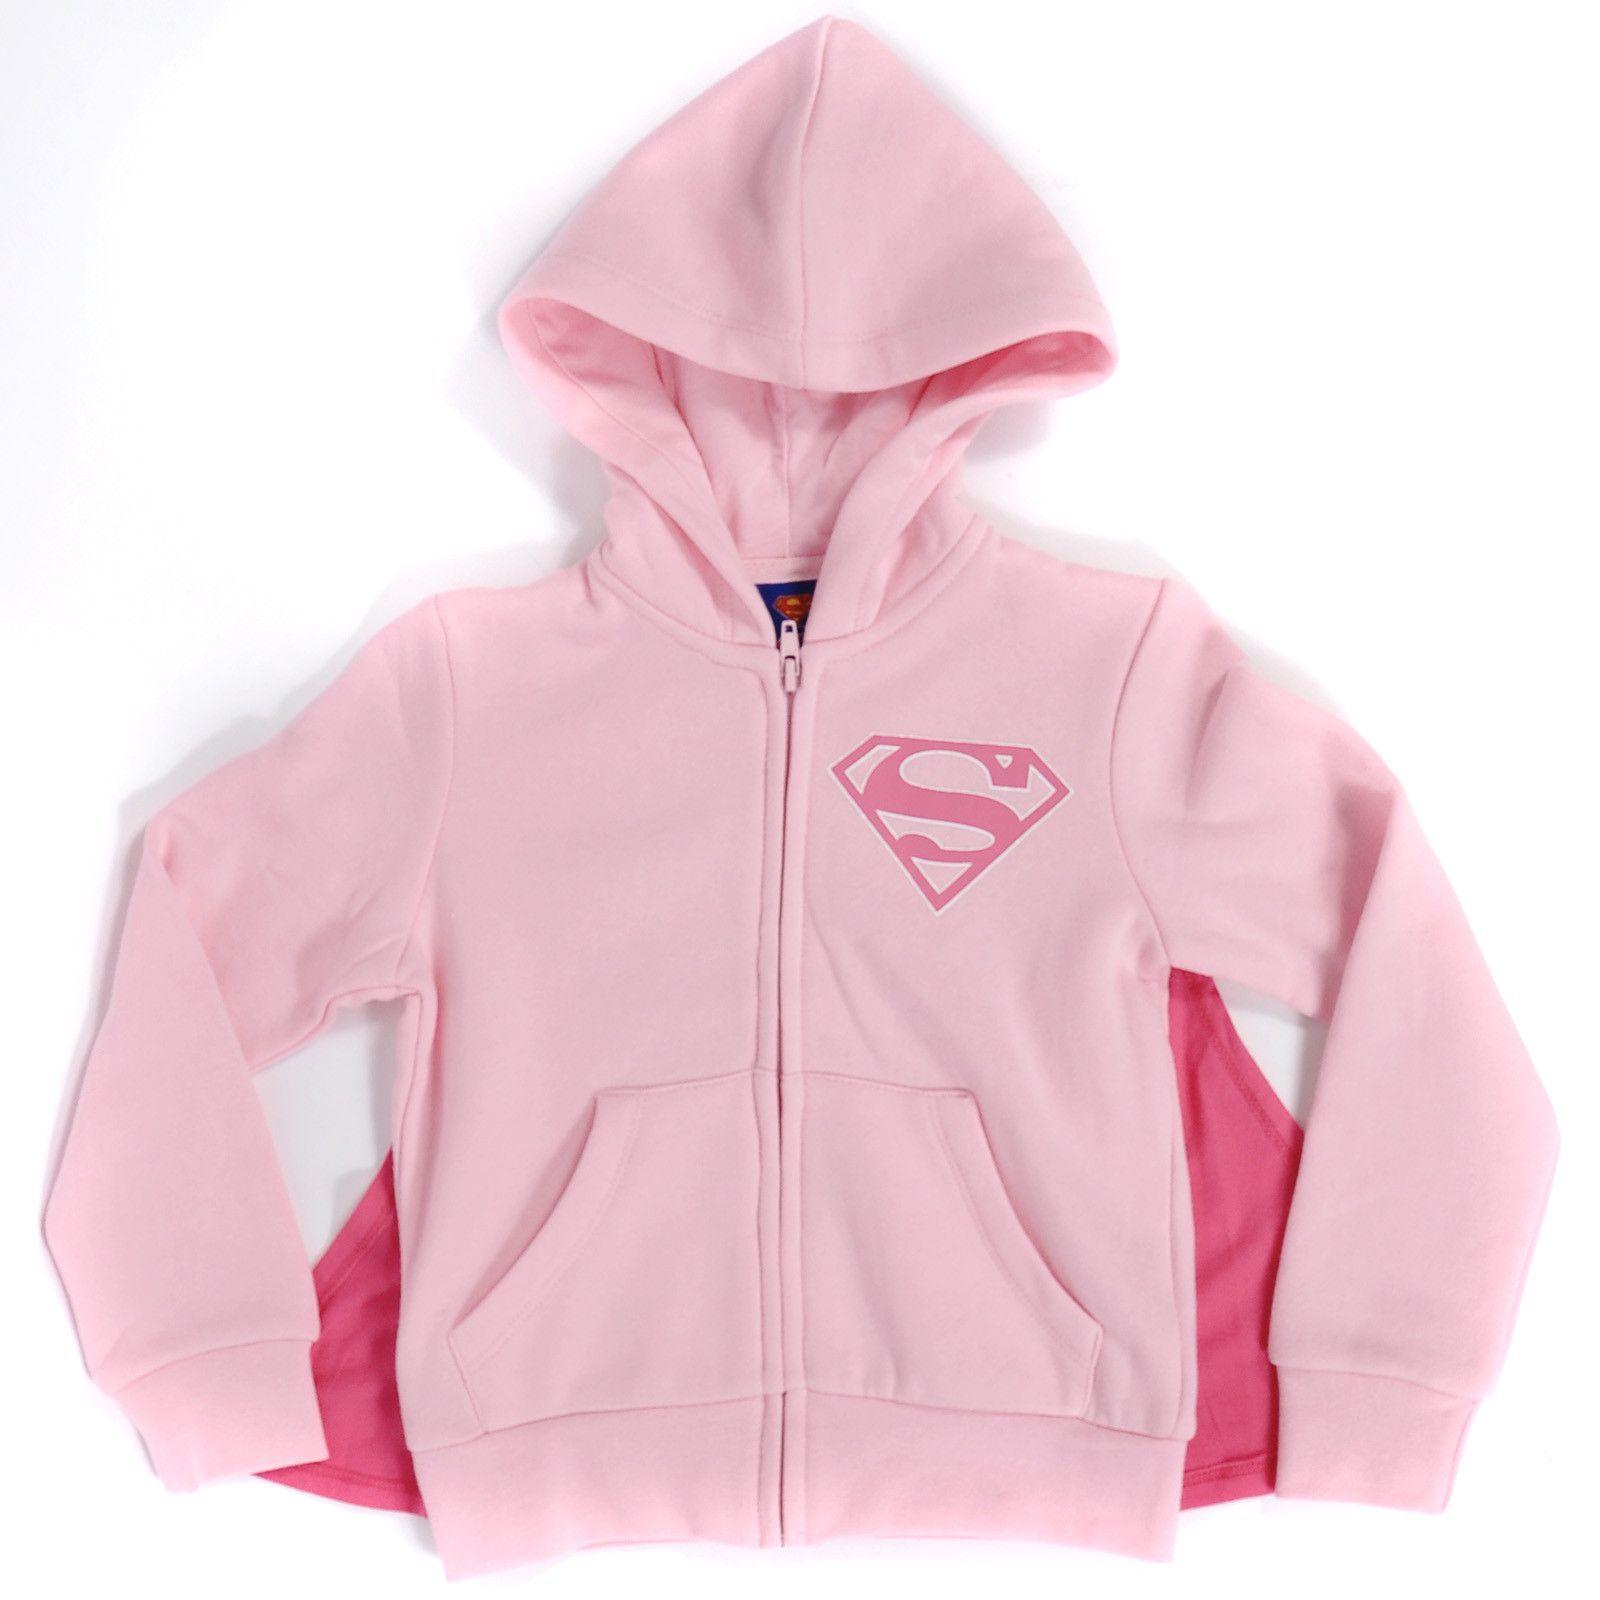 Supergirl Girls Pink Caped Hoodie